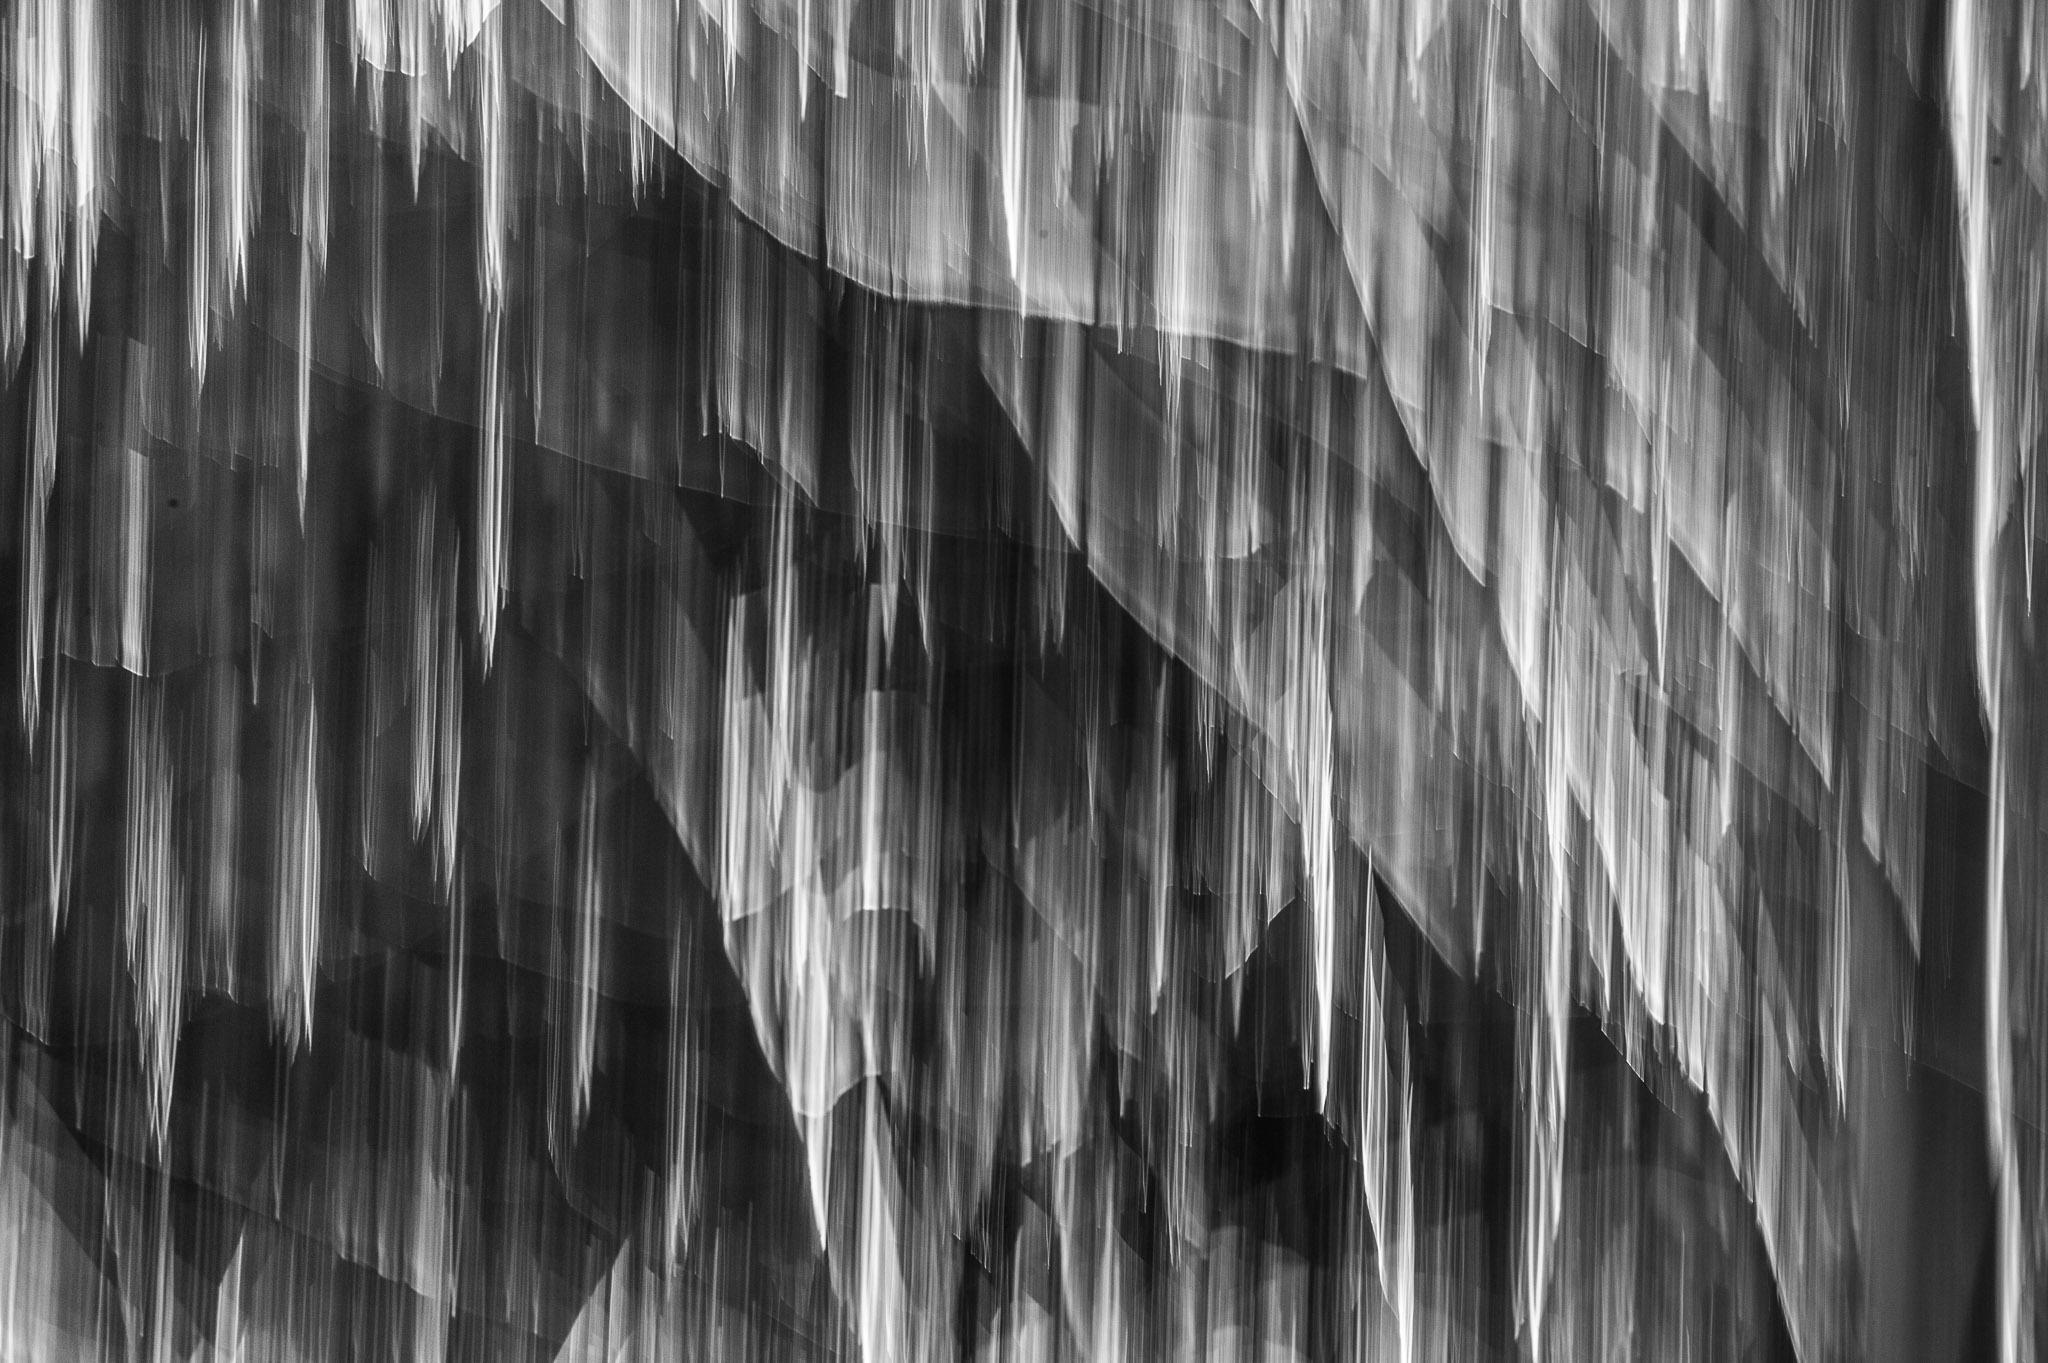 Jason-Davis-Images-Yosemite-0035.jpg